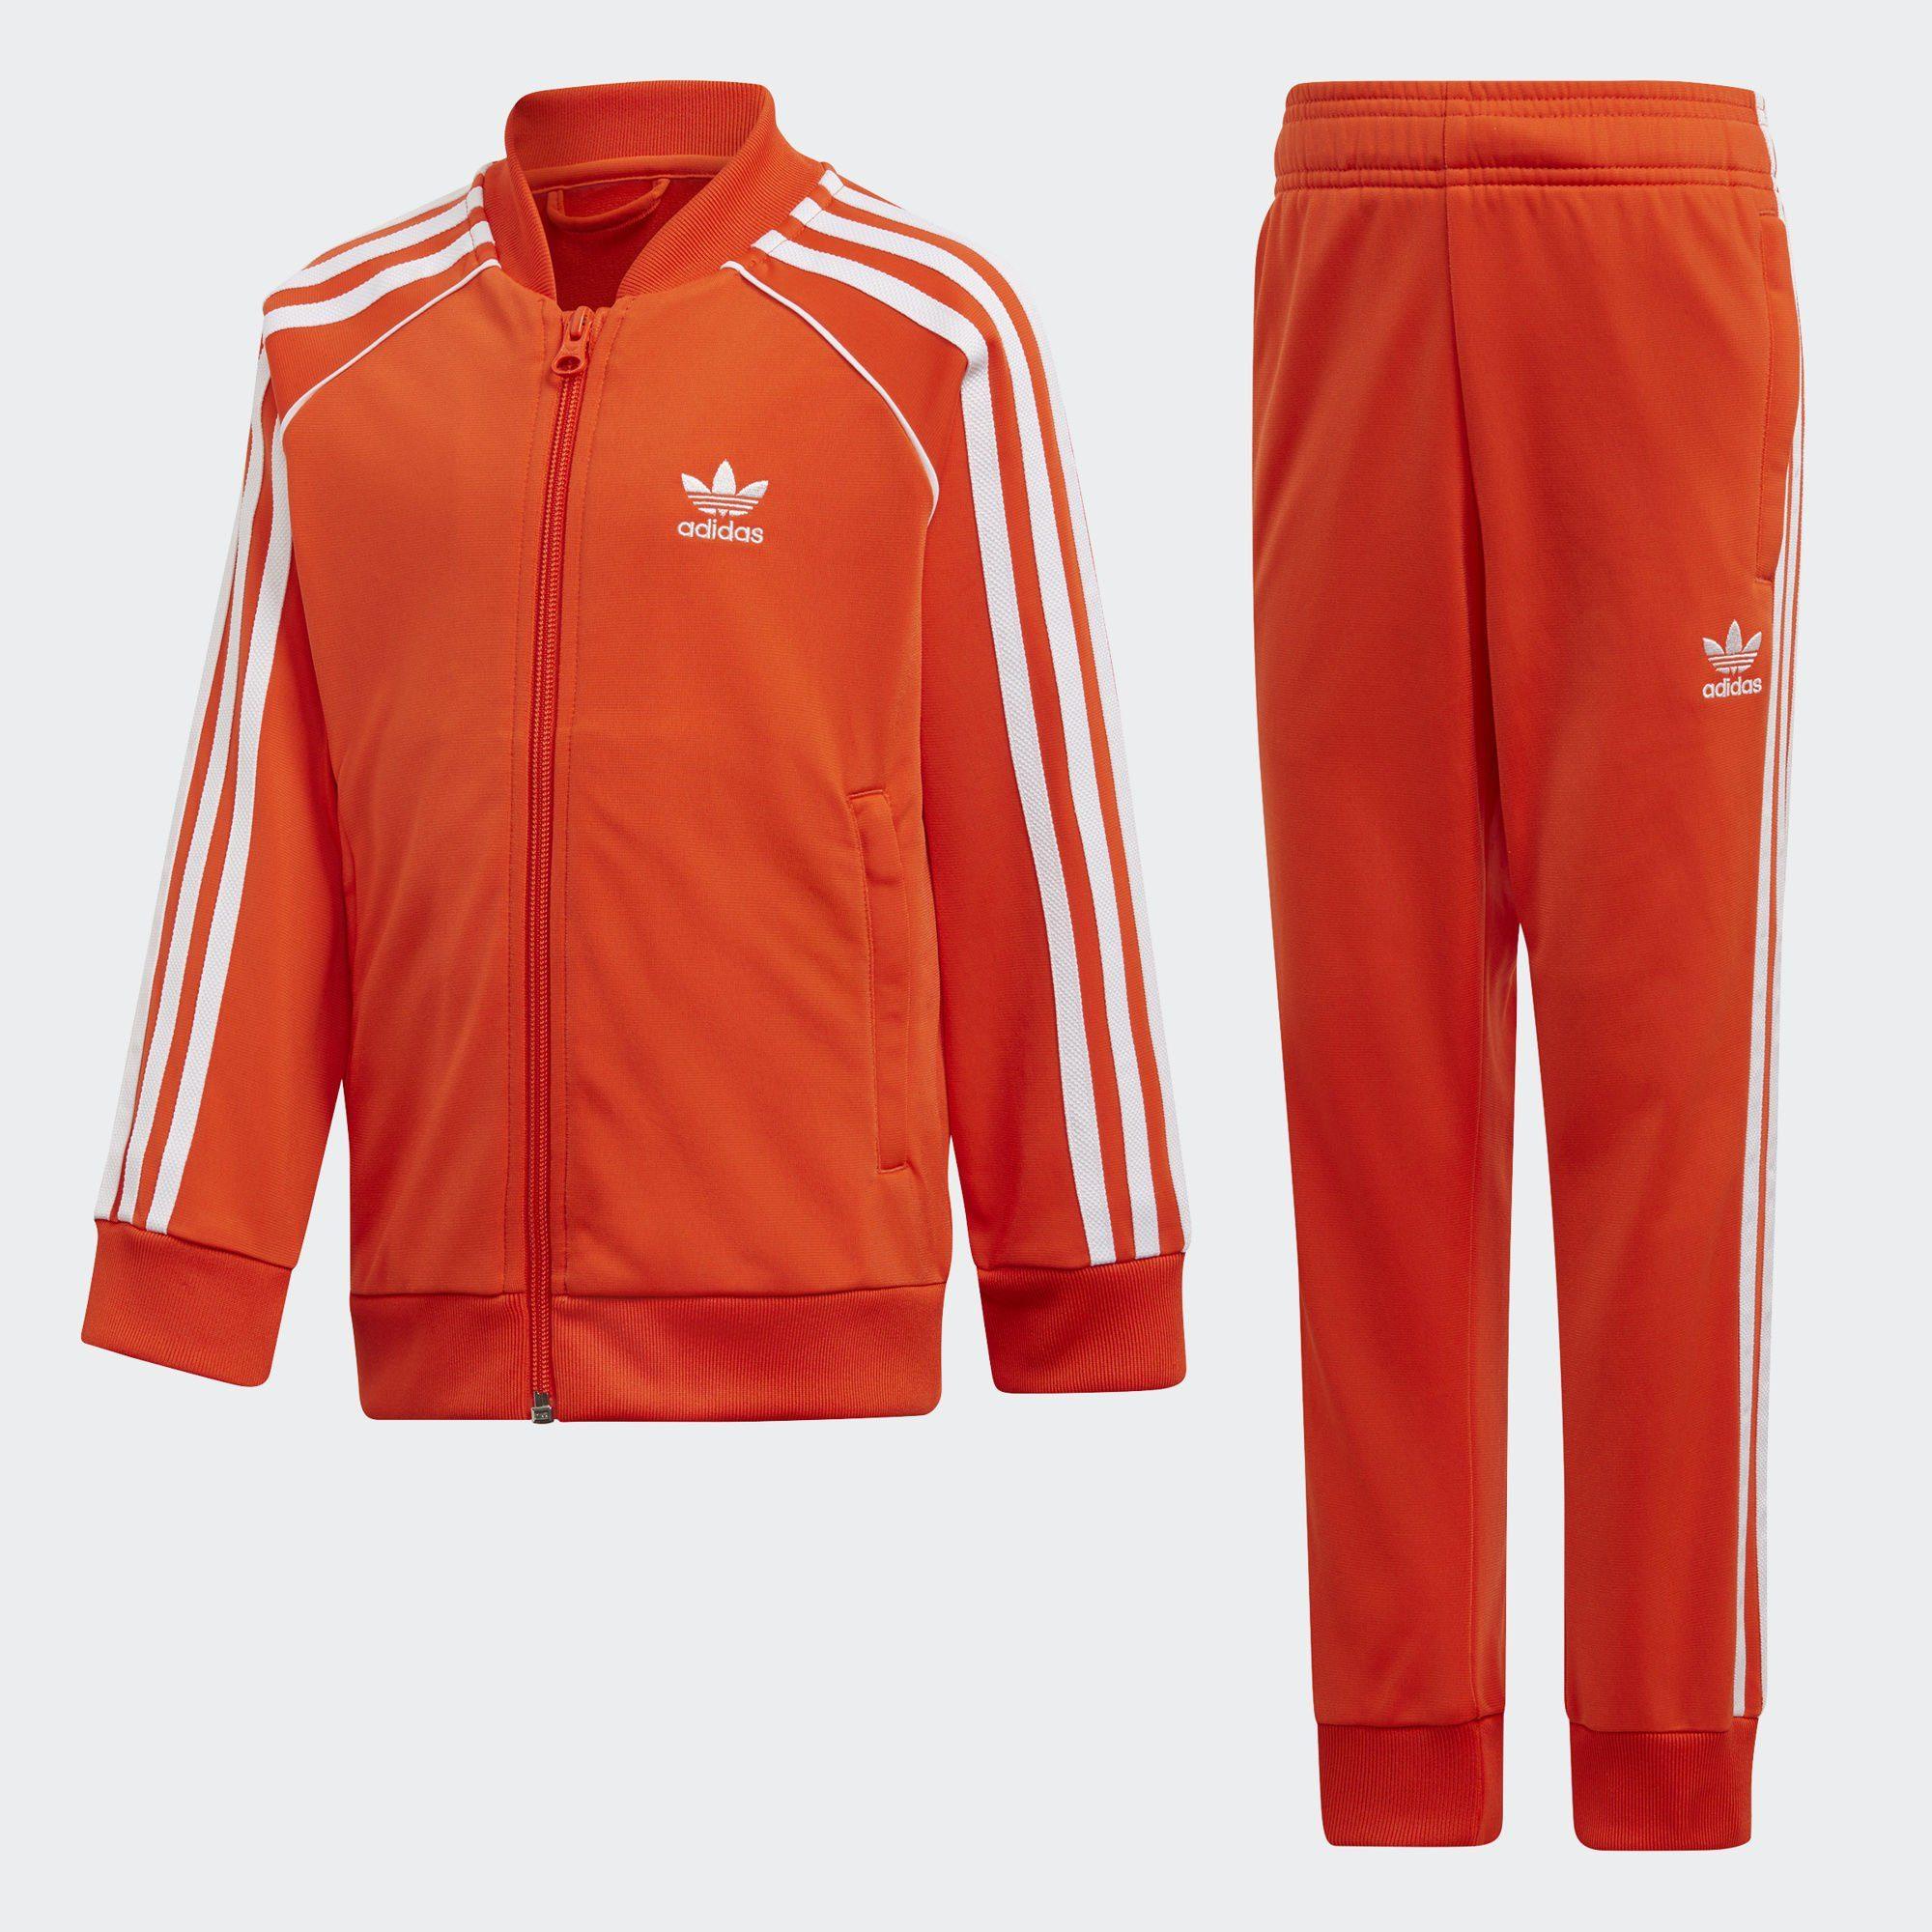 Originals Trainingsanzug Adidas »sst Adidas Trainingsanzug« Originals YtwEzRqt